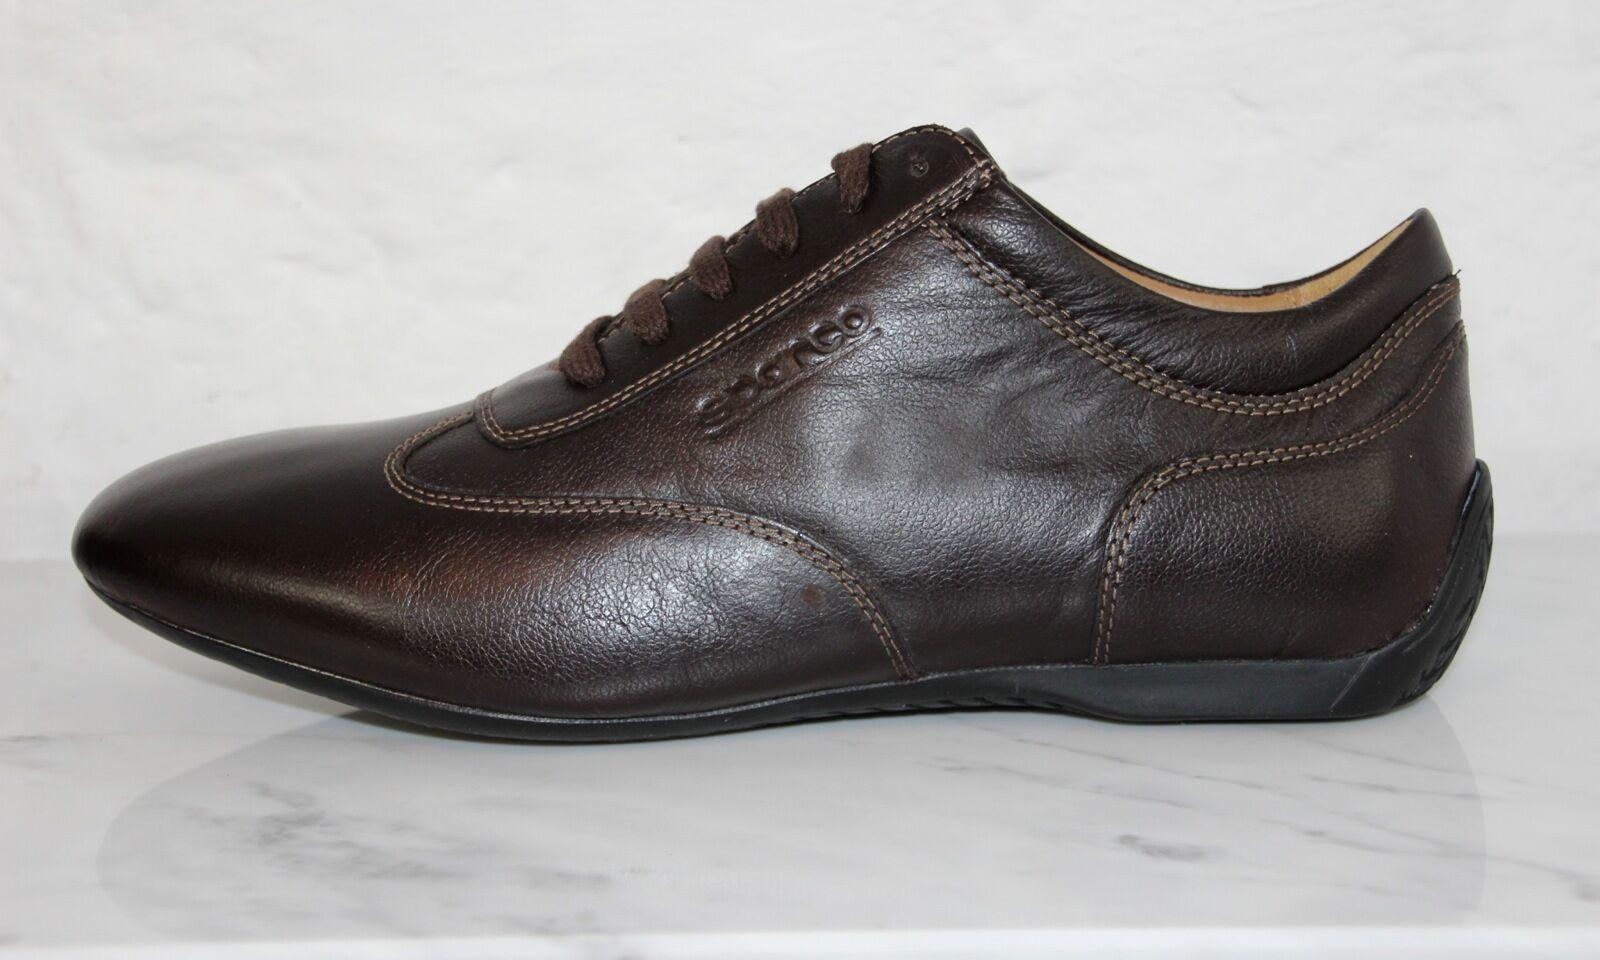 SPARCO Fahrerschuhe, Sneaker Racing Schuhe, OVP IMOLA Gr.40 Leder braun OVP Schuhe, 9fbc52